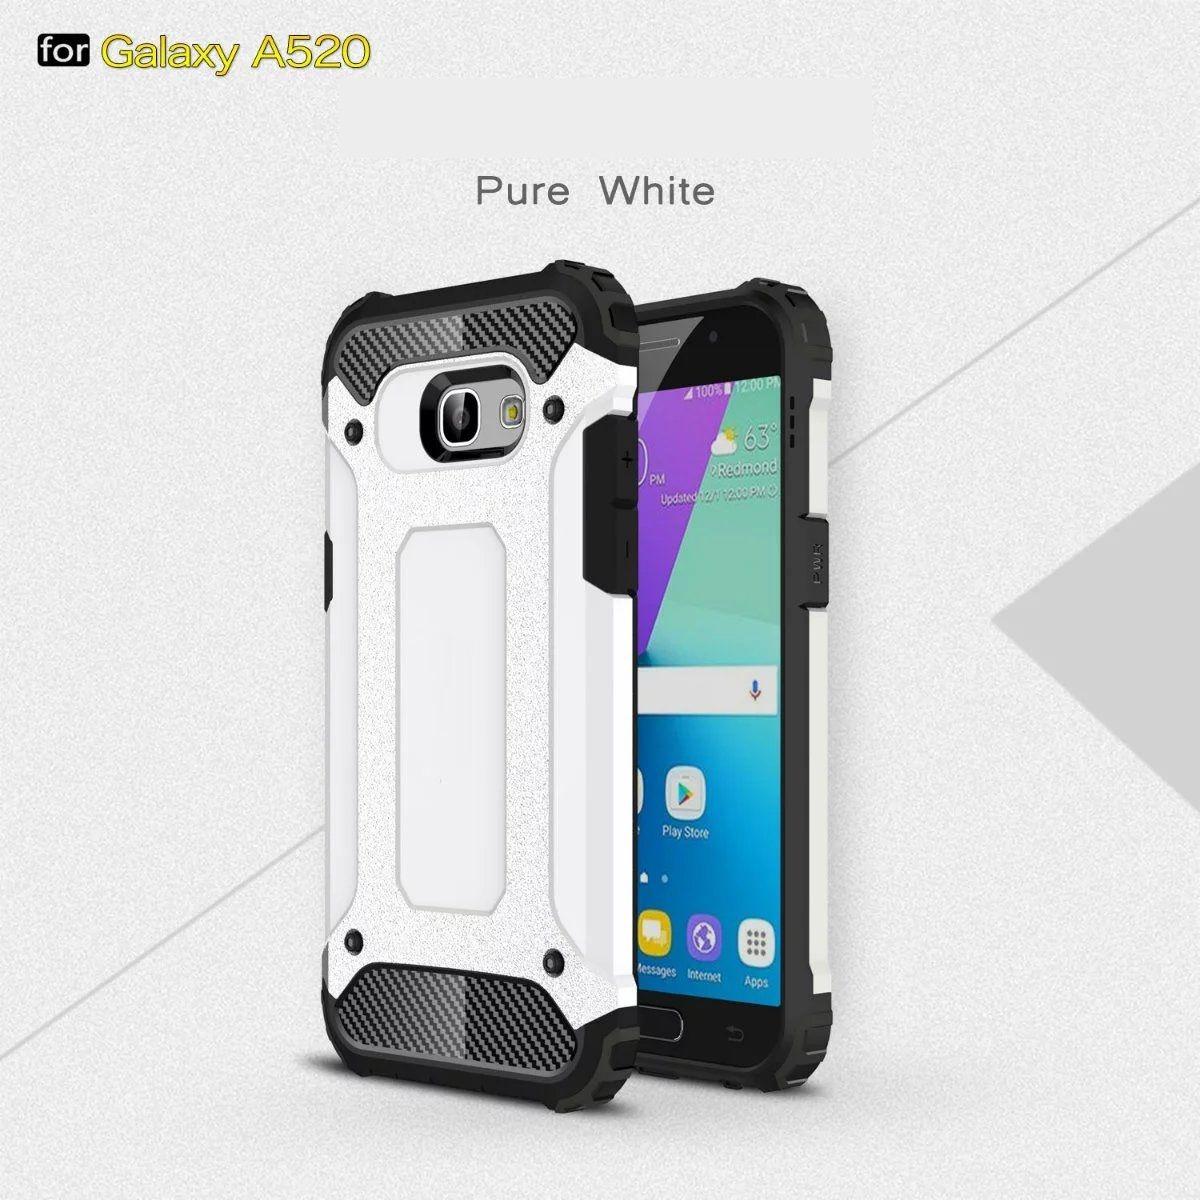 FÜR Samsung Galaxy A3 A5 A7 2017 J7 PLUS S9 S9 PLUS A5 2018 A8 2018 Rüstung Hybrid Defender Fall TPU + PC Stoßfest Abdeckung Fall 50 TEILE / LOS